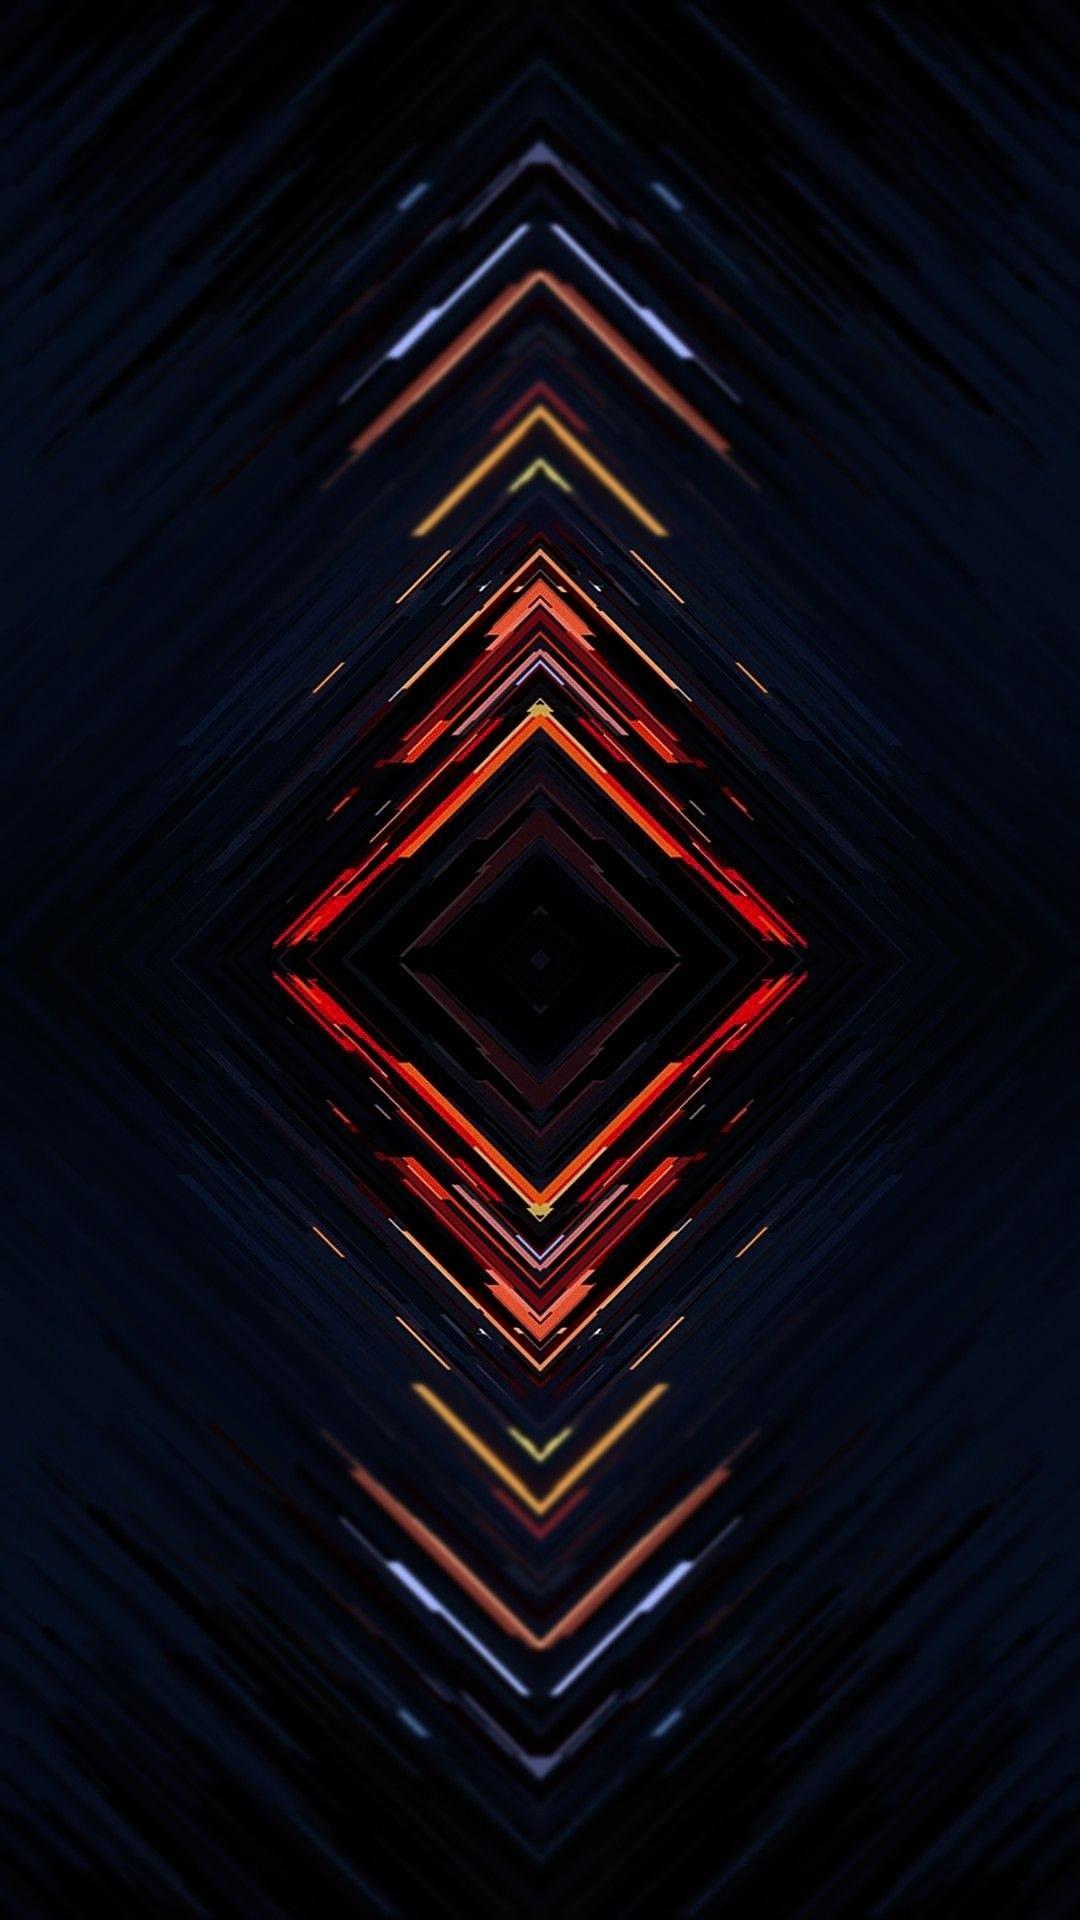 Minimalist iPhone wallpaper